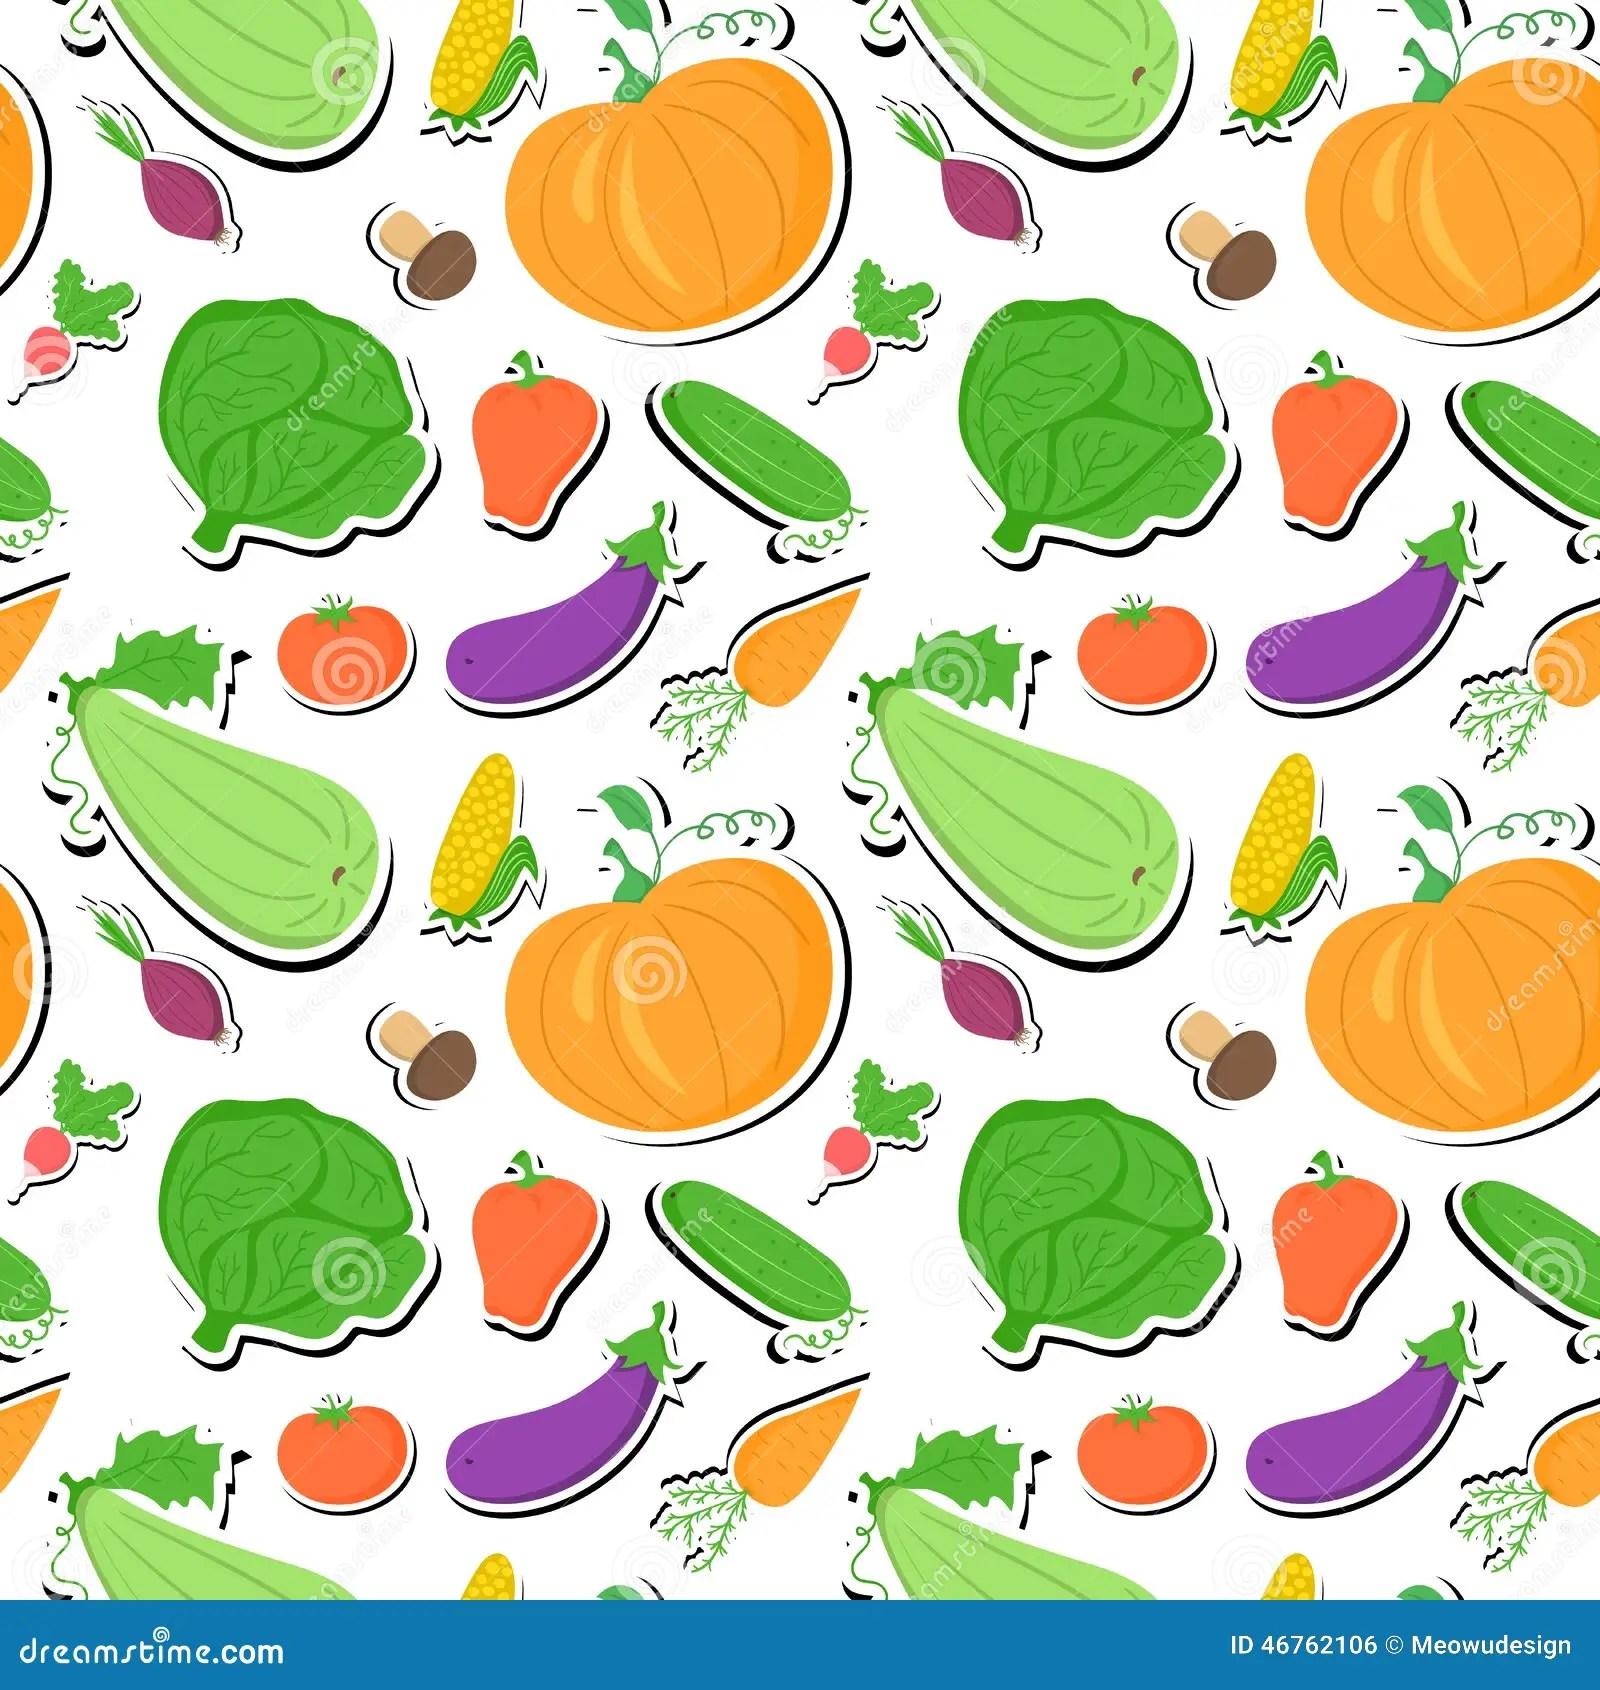 kitchen wallpaper patterns viking outdoor vegetables seamless pattern vector background stock